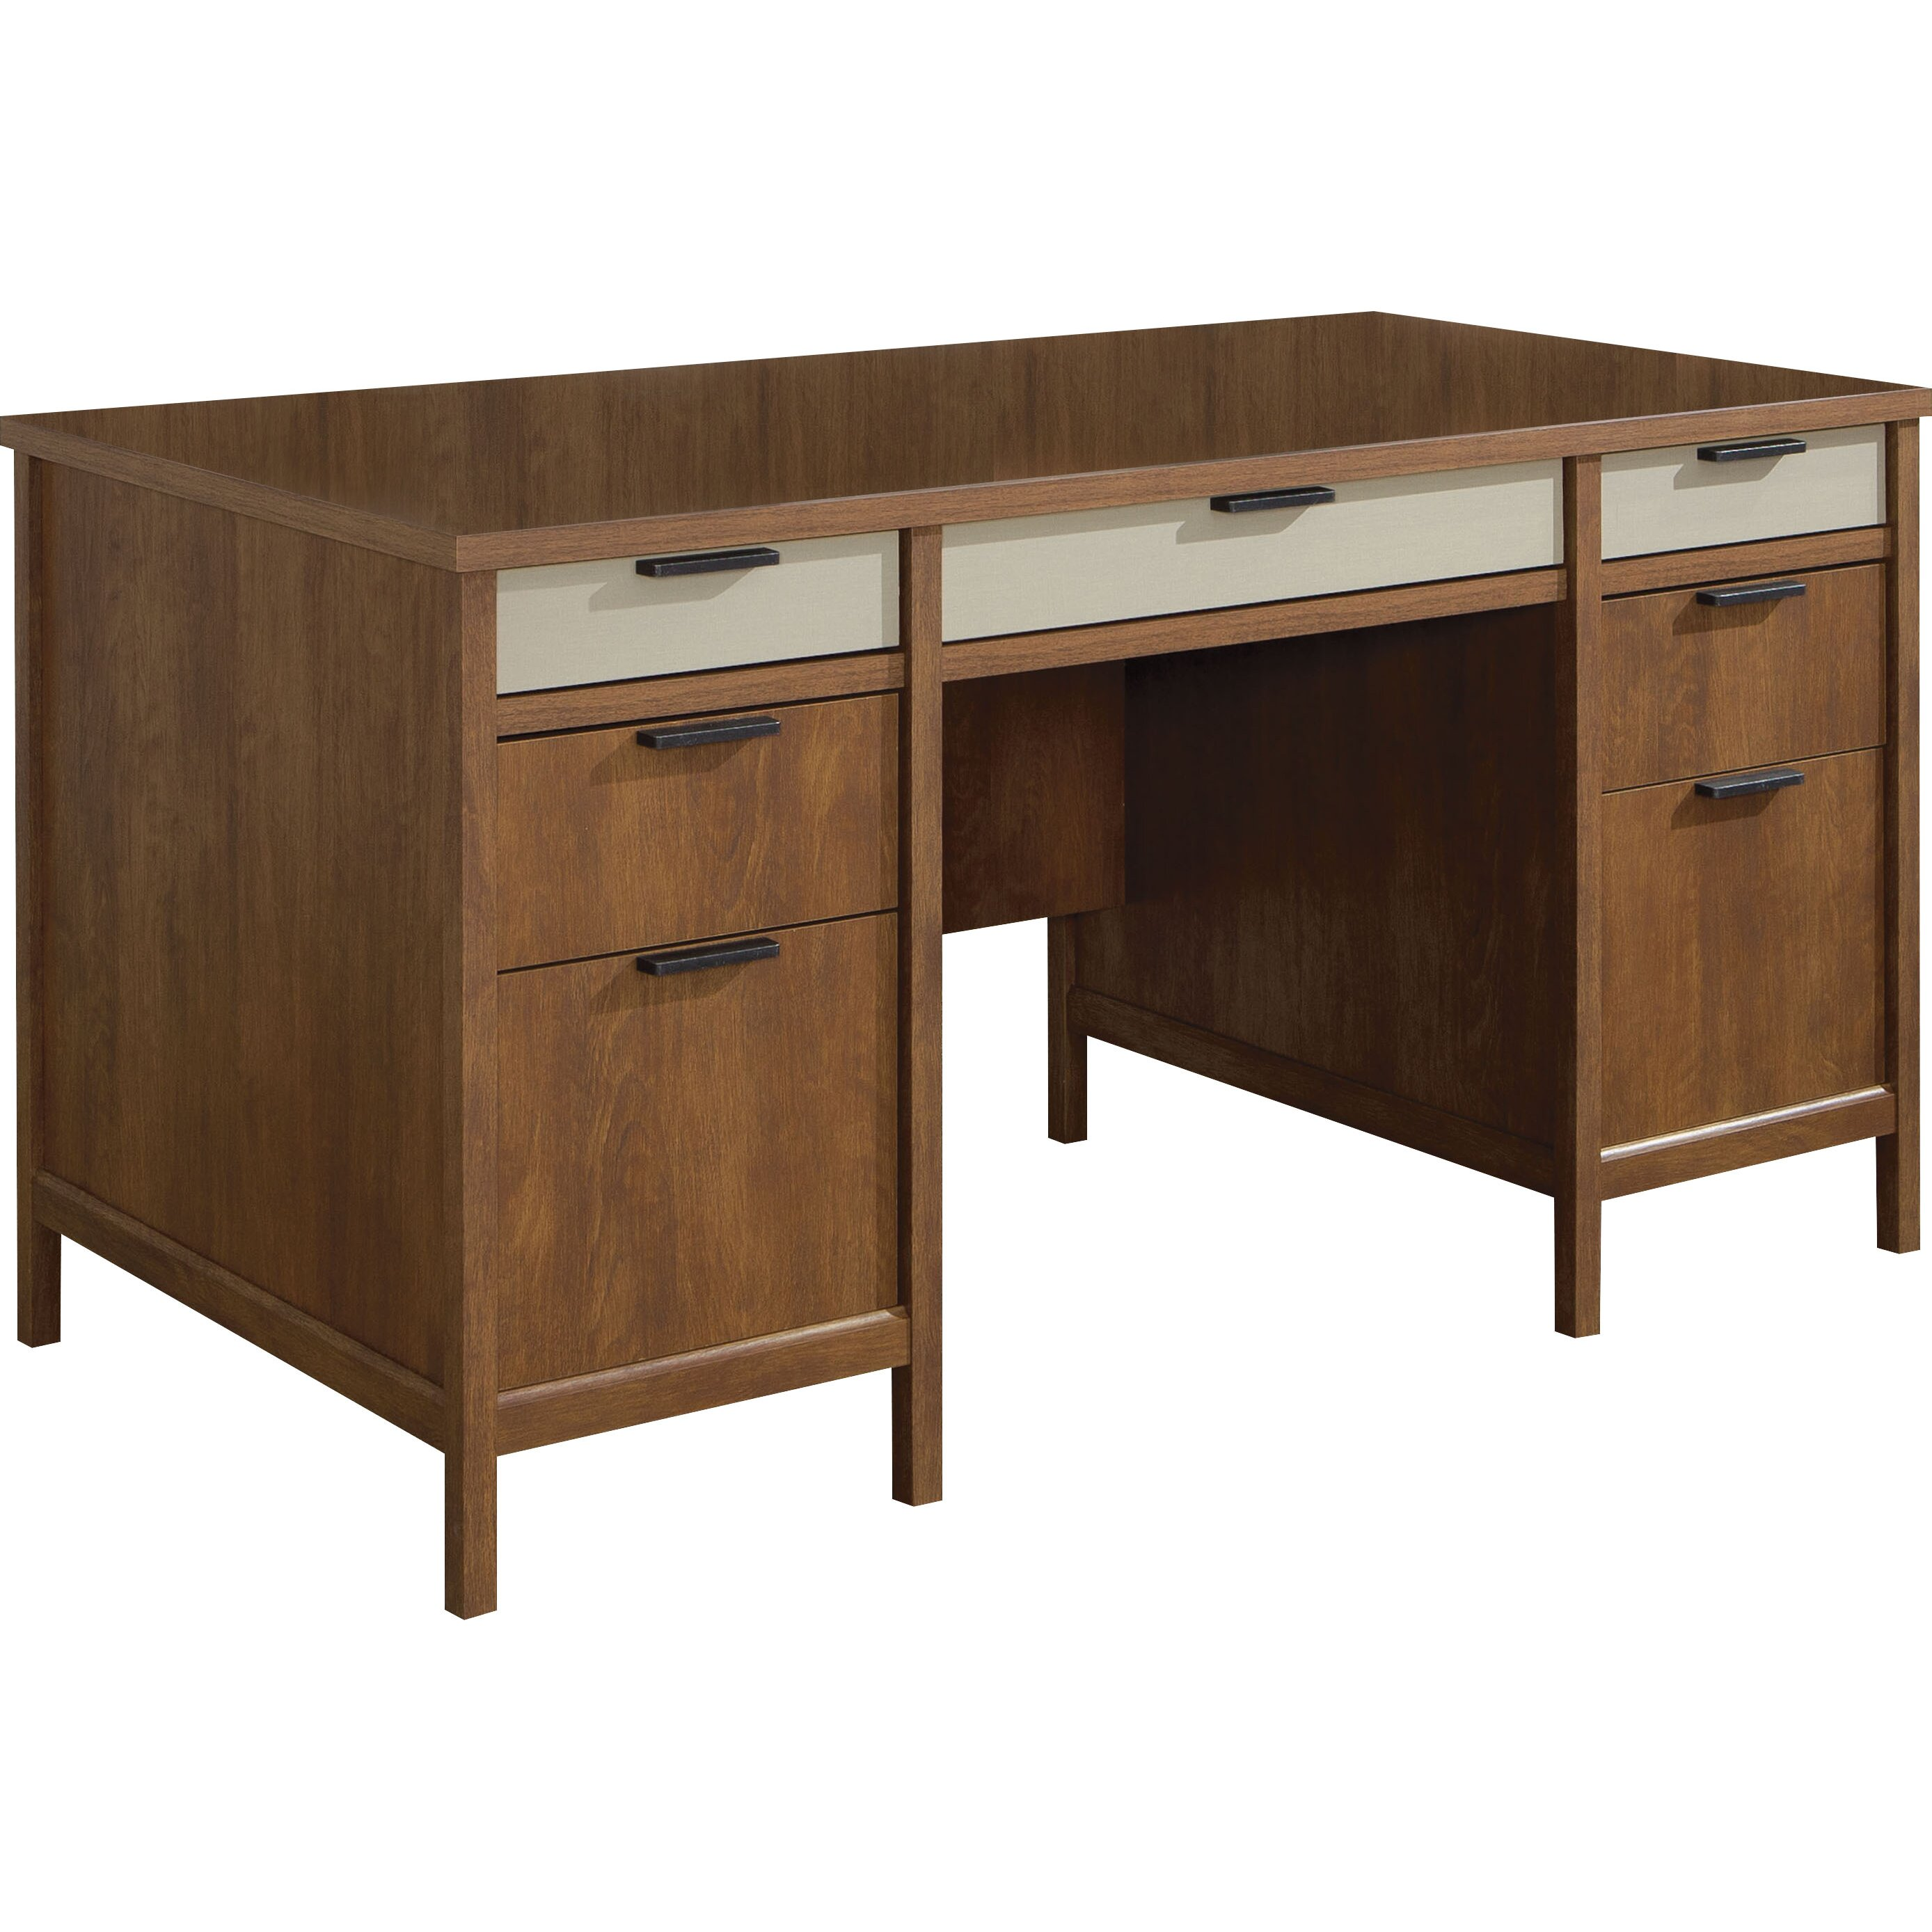 Sauder Desks Fabulous Sauder Desks With Sauder Desks